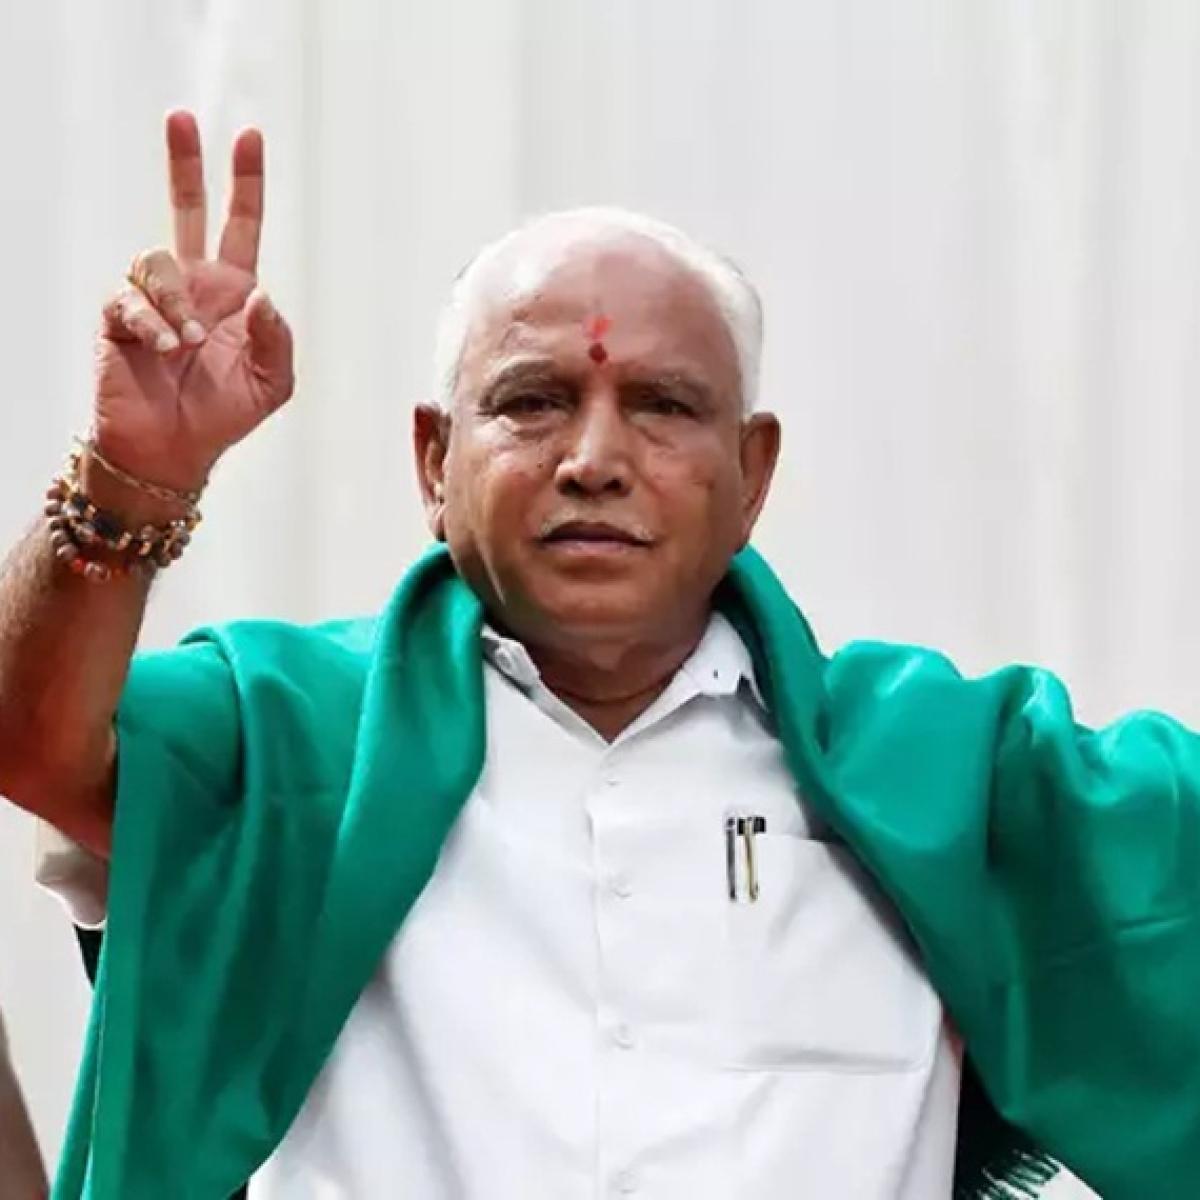 EC files FIRs against Karnataka CM Yediyurappa over 'casteist' speeches